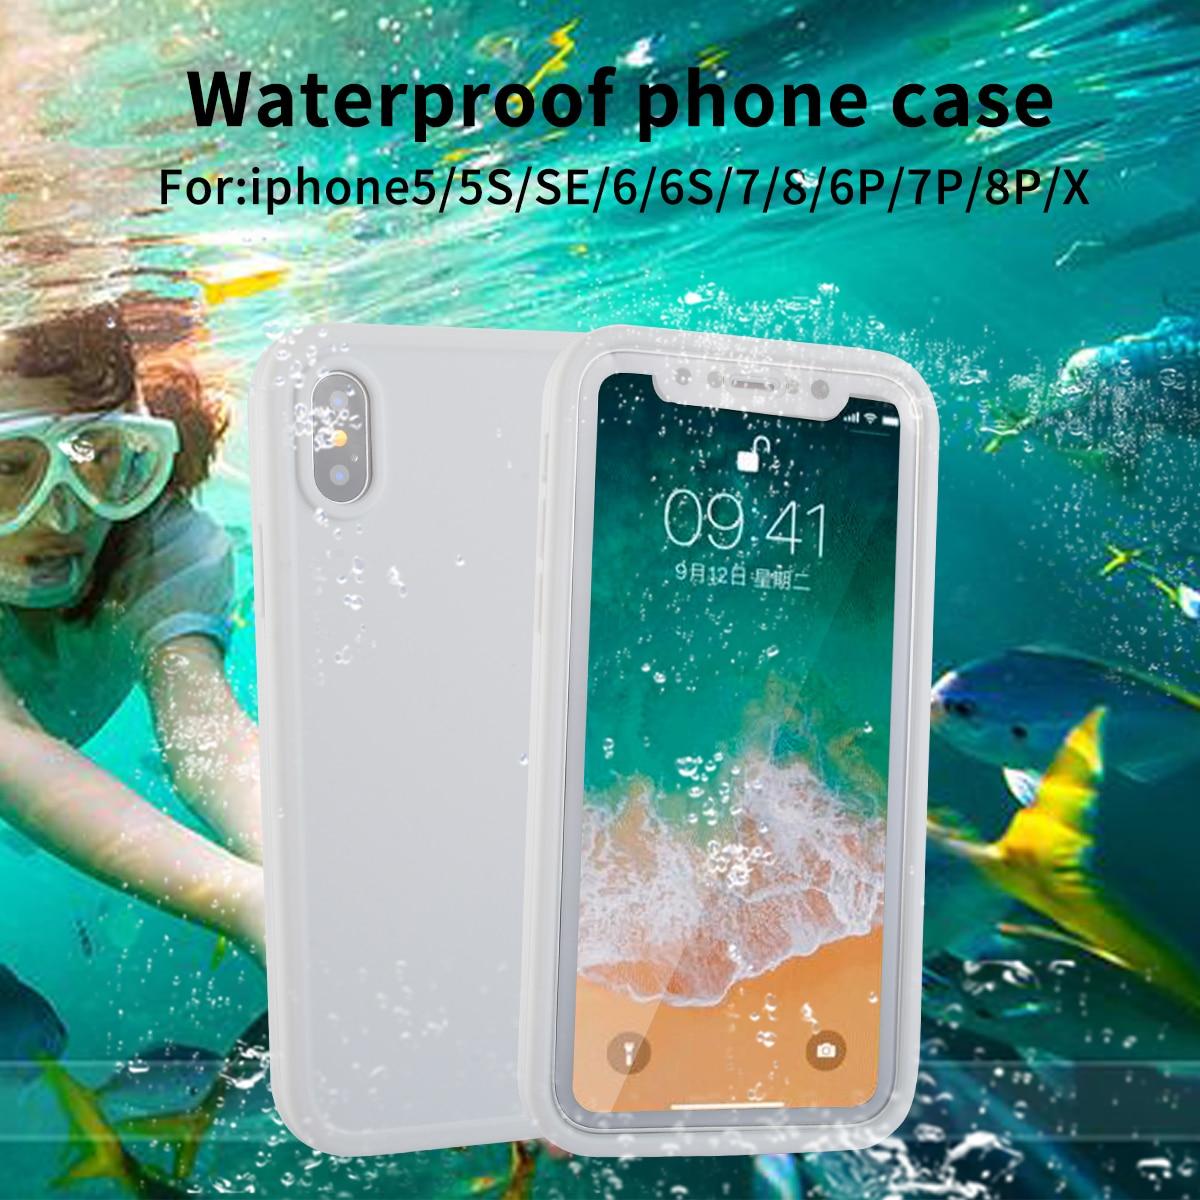 IP68 настоящий водонепроницаемый чехол для iPhone X 8 7 Plus 6 6 S Plus полная защита чехол для iPhone 5 5S XR XS Max